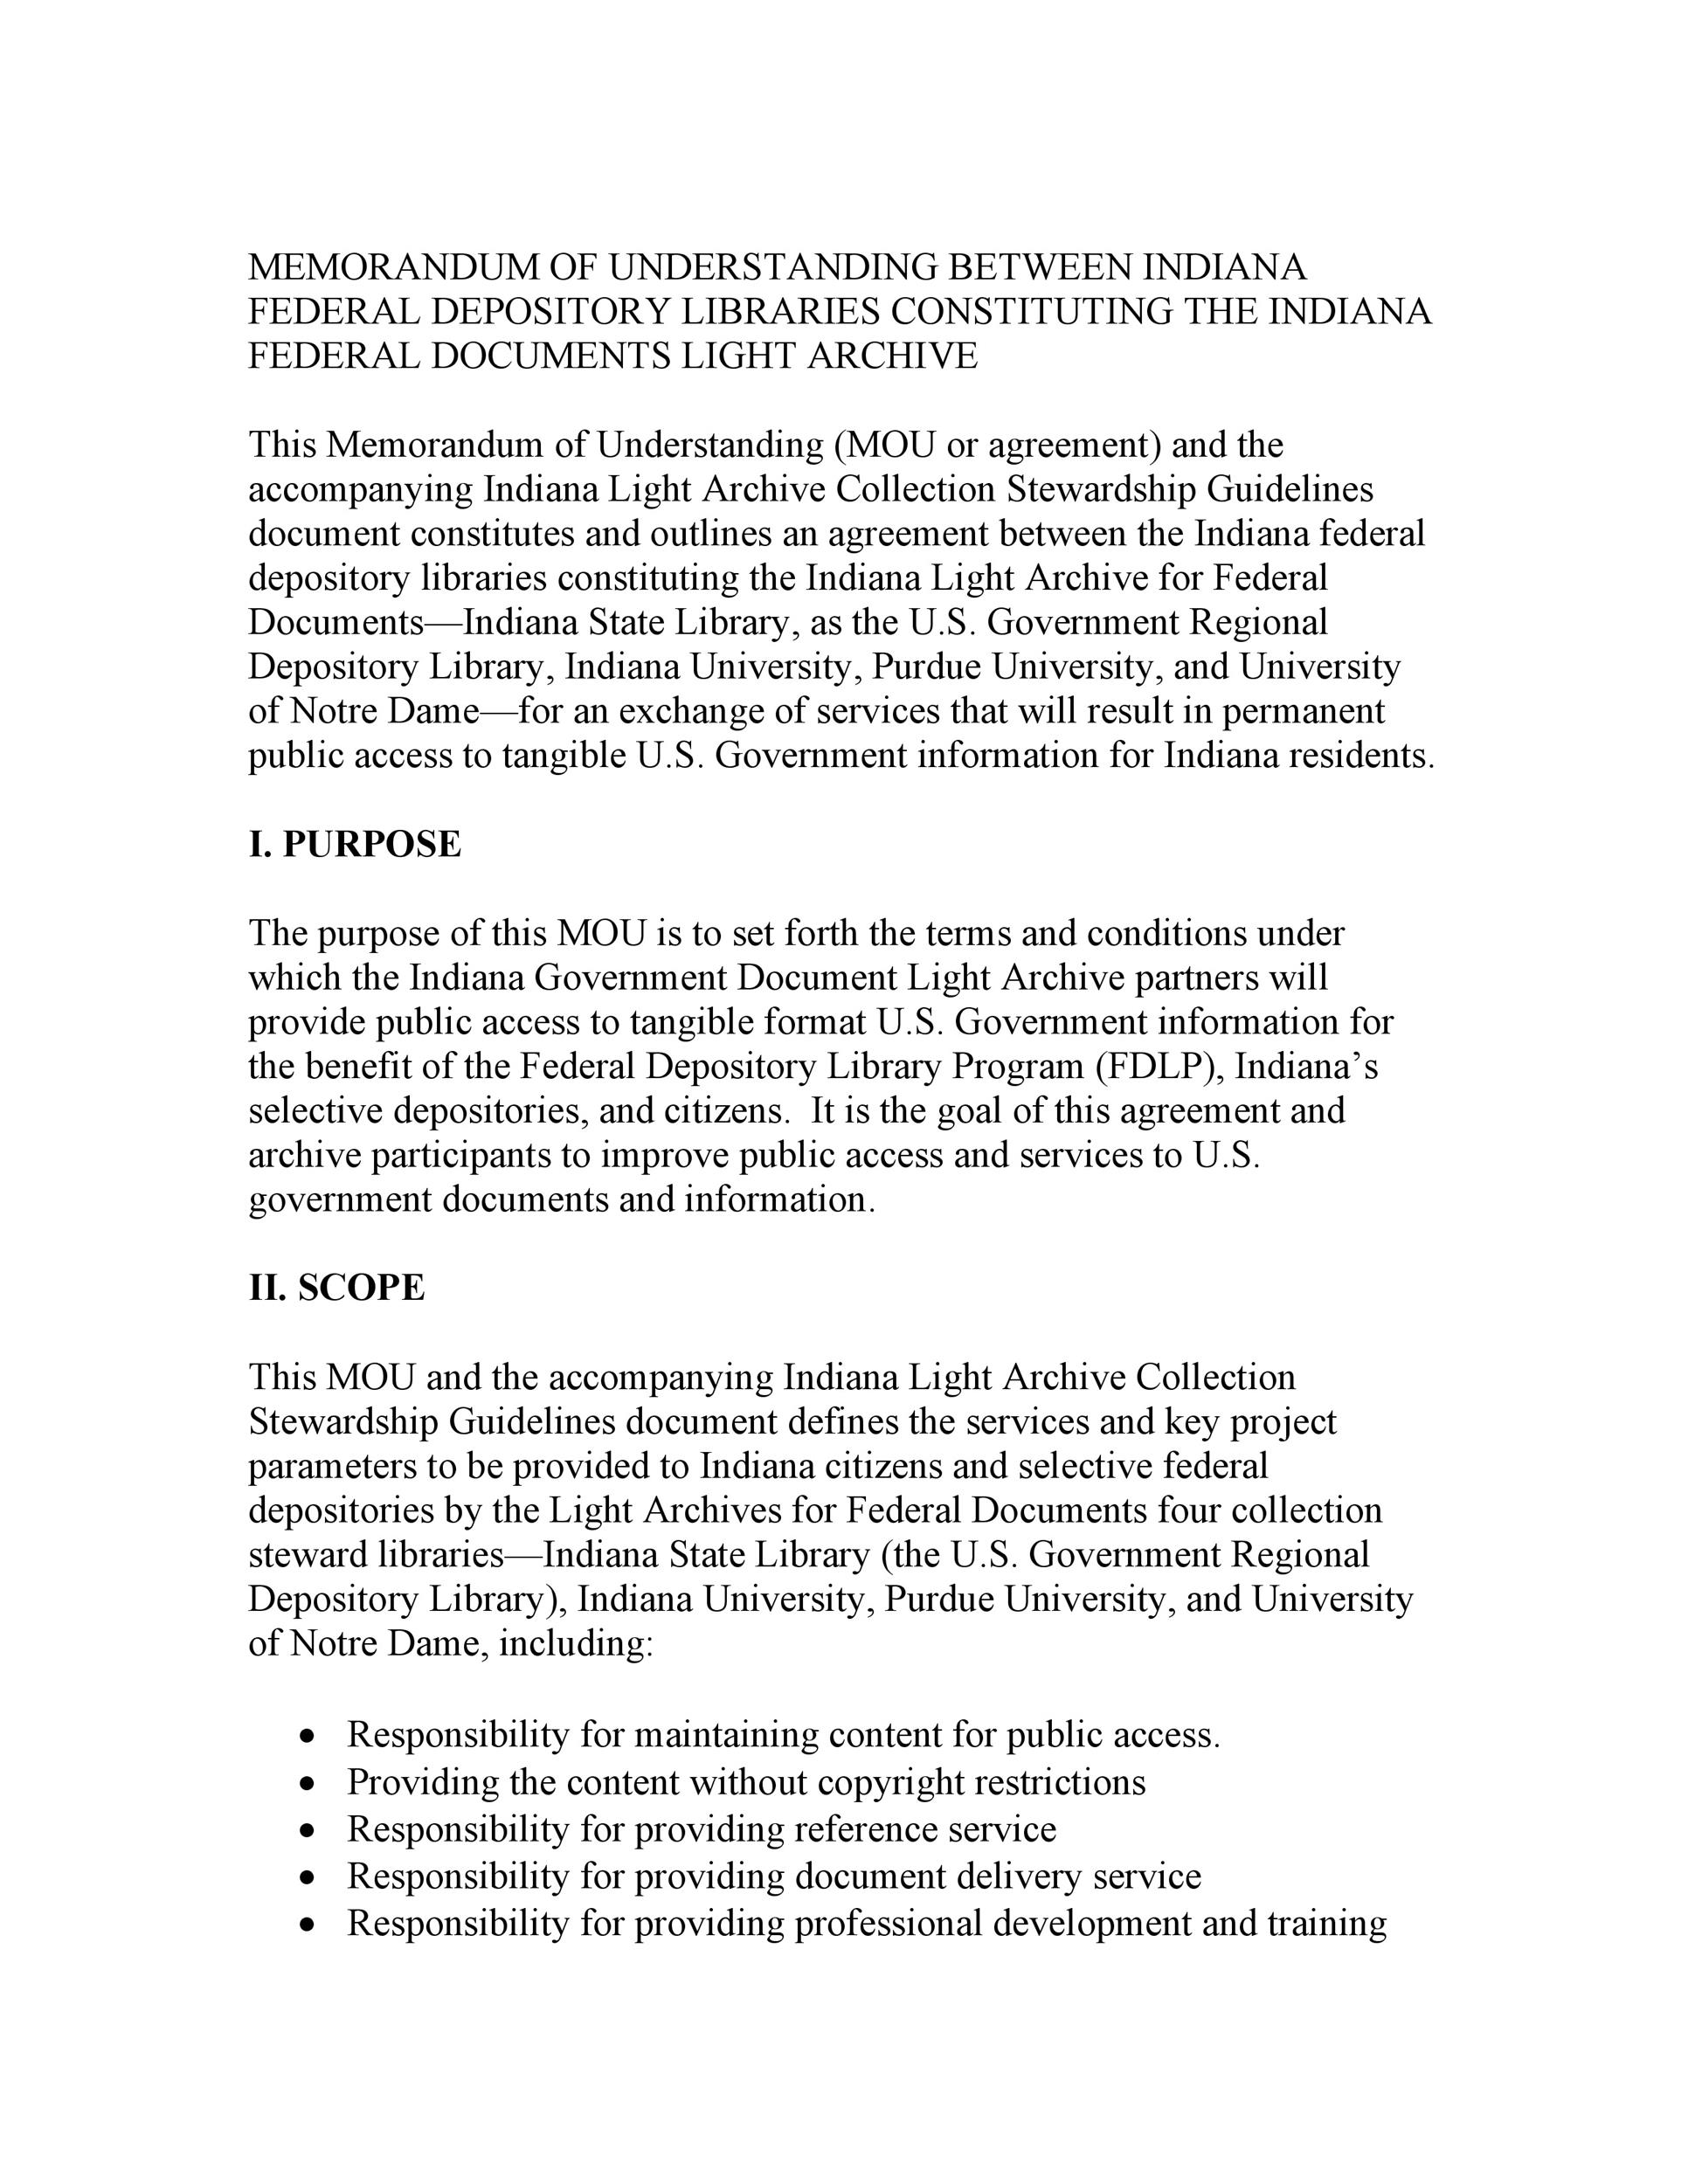 Free Memorandum of Understanding Template 29